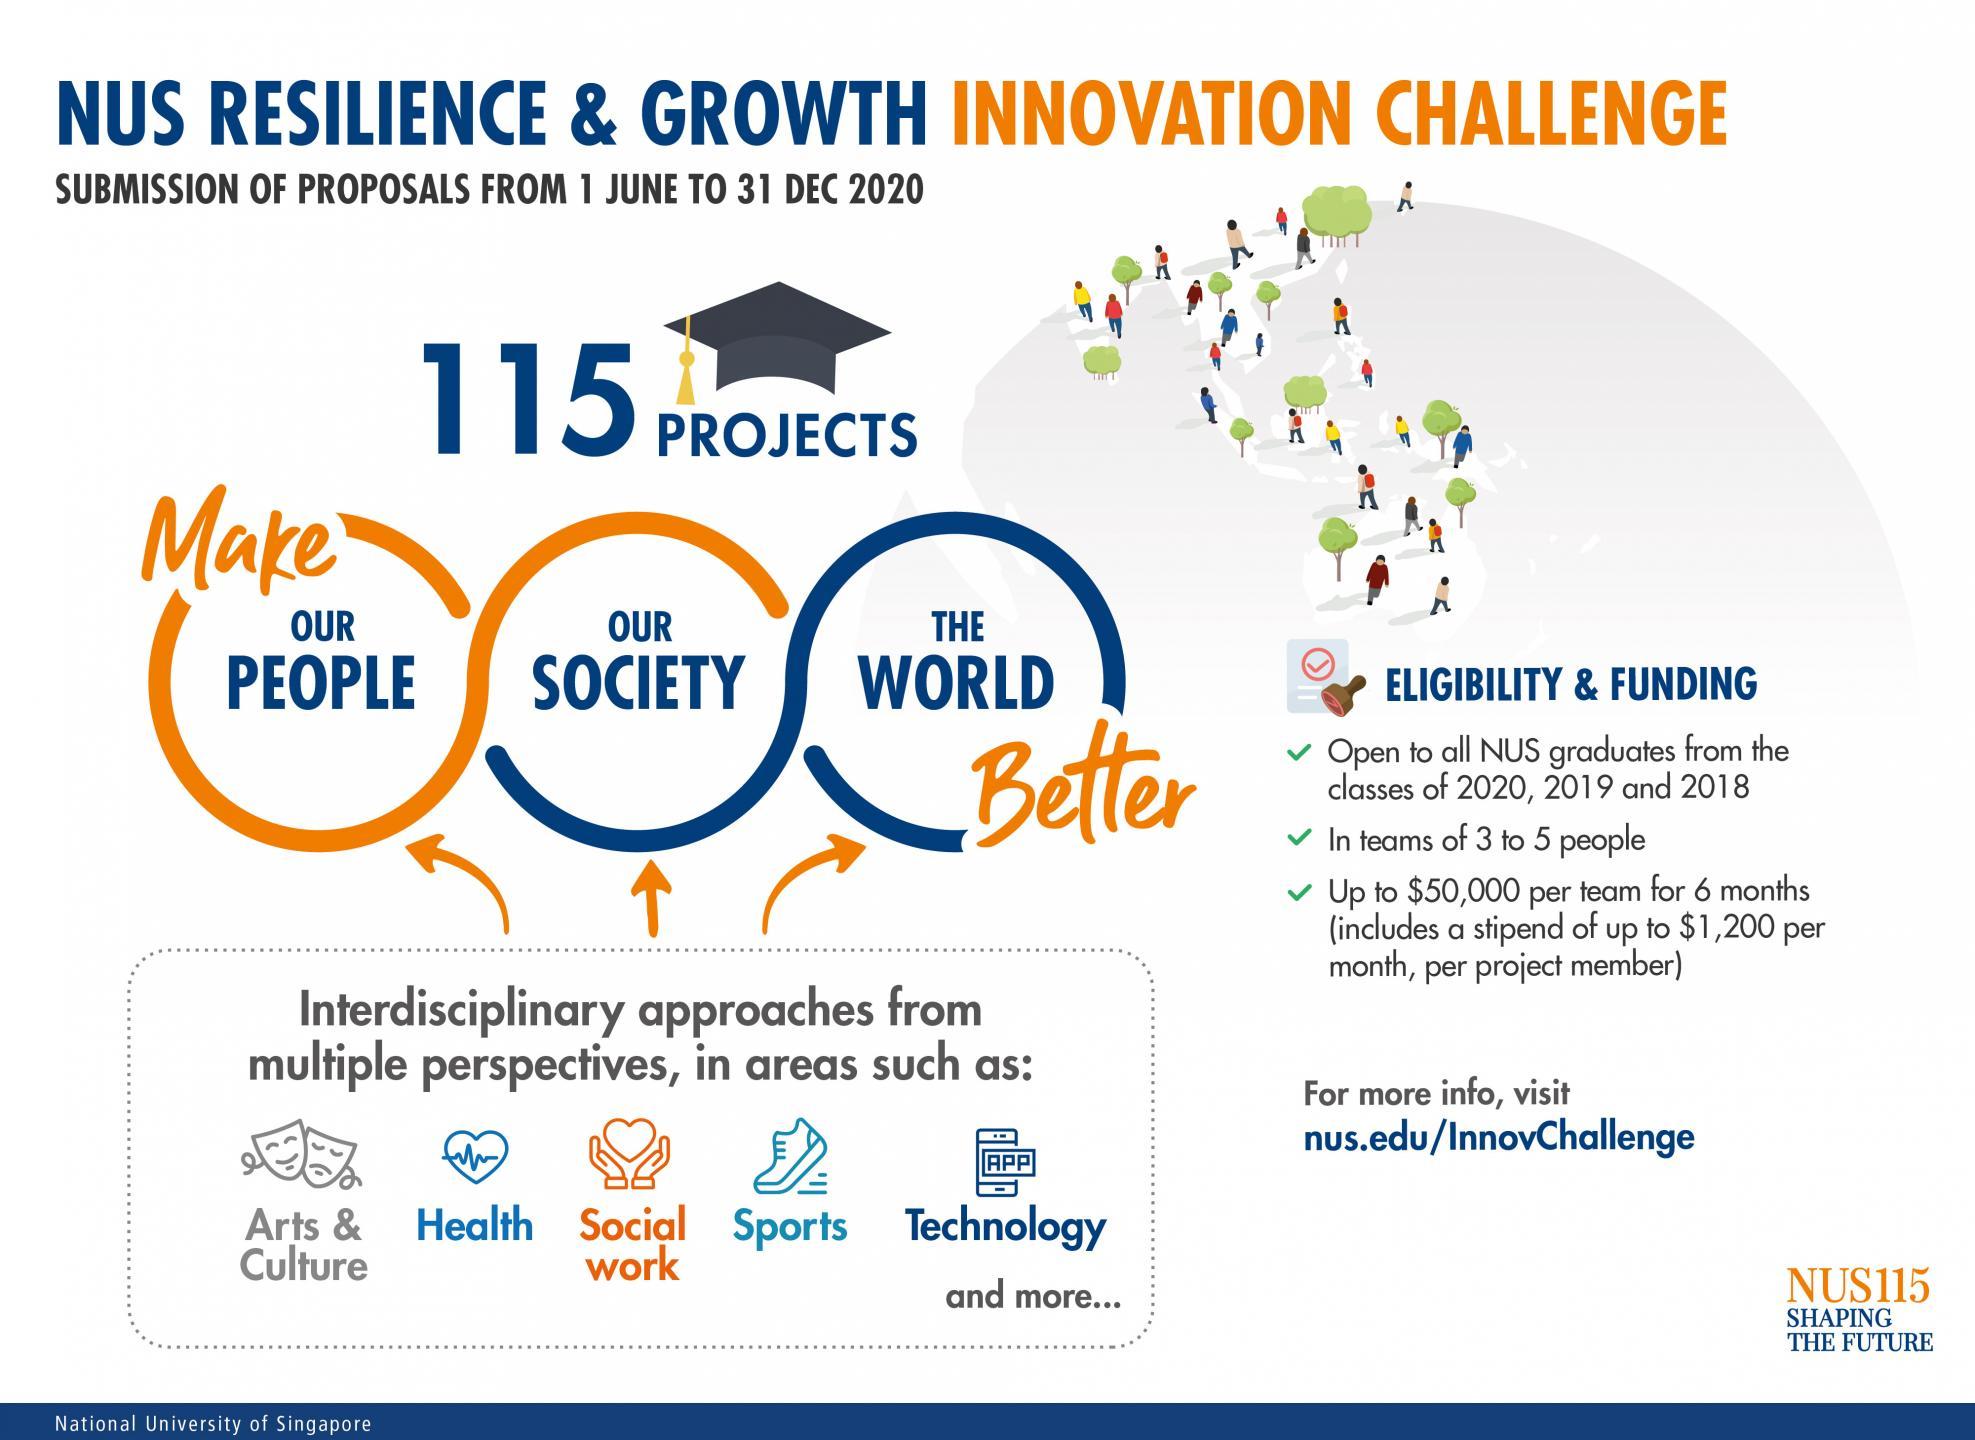 2020 0505 Innovation challenge-Press release.jpg